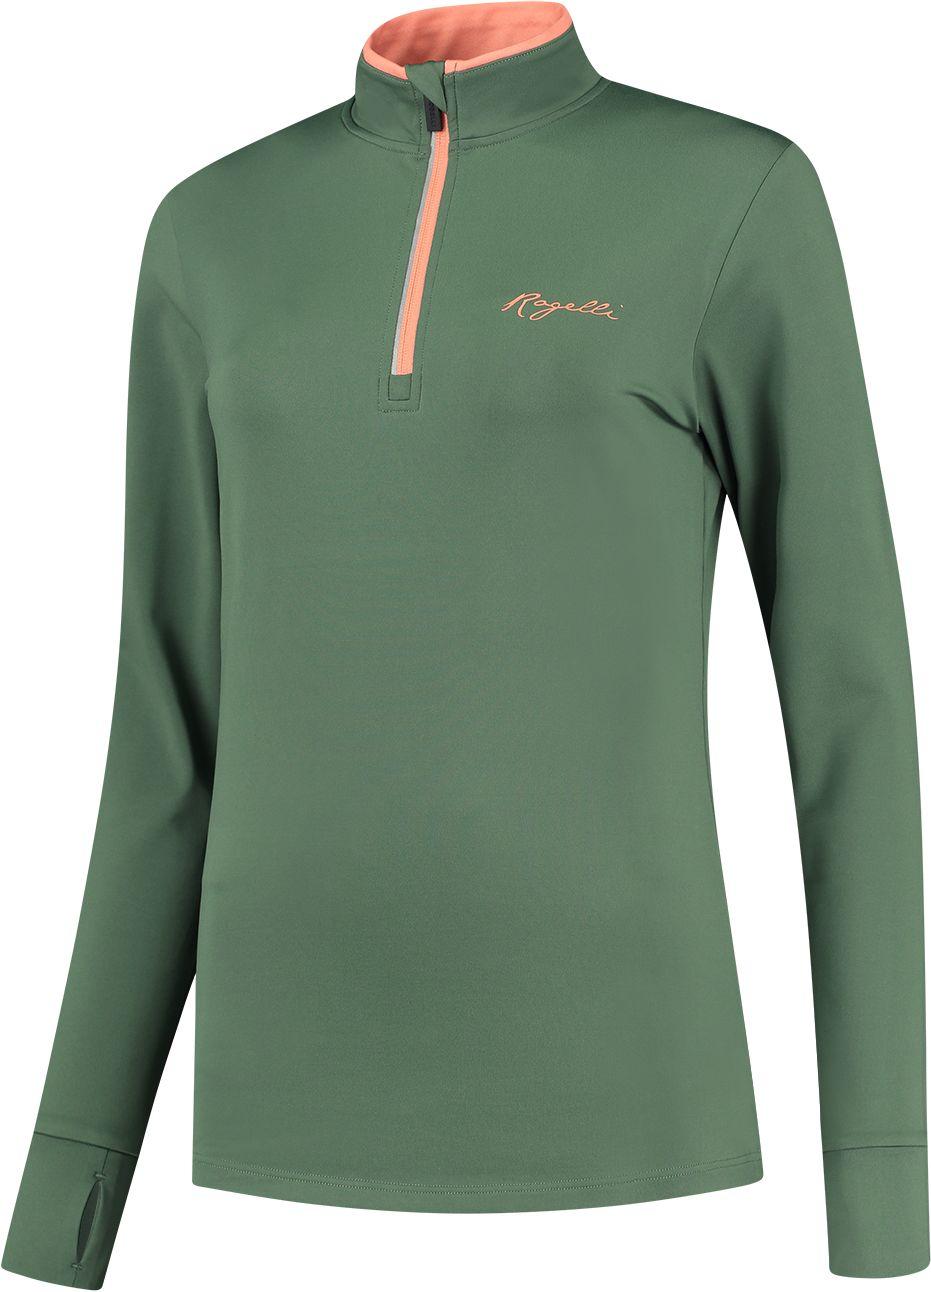 ROGELLI bluza do biegania damska SNAKE green ROG351110 Rozmiar: M,ROG351110.XS